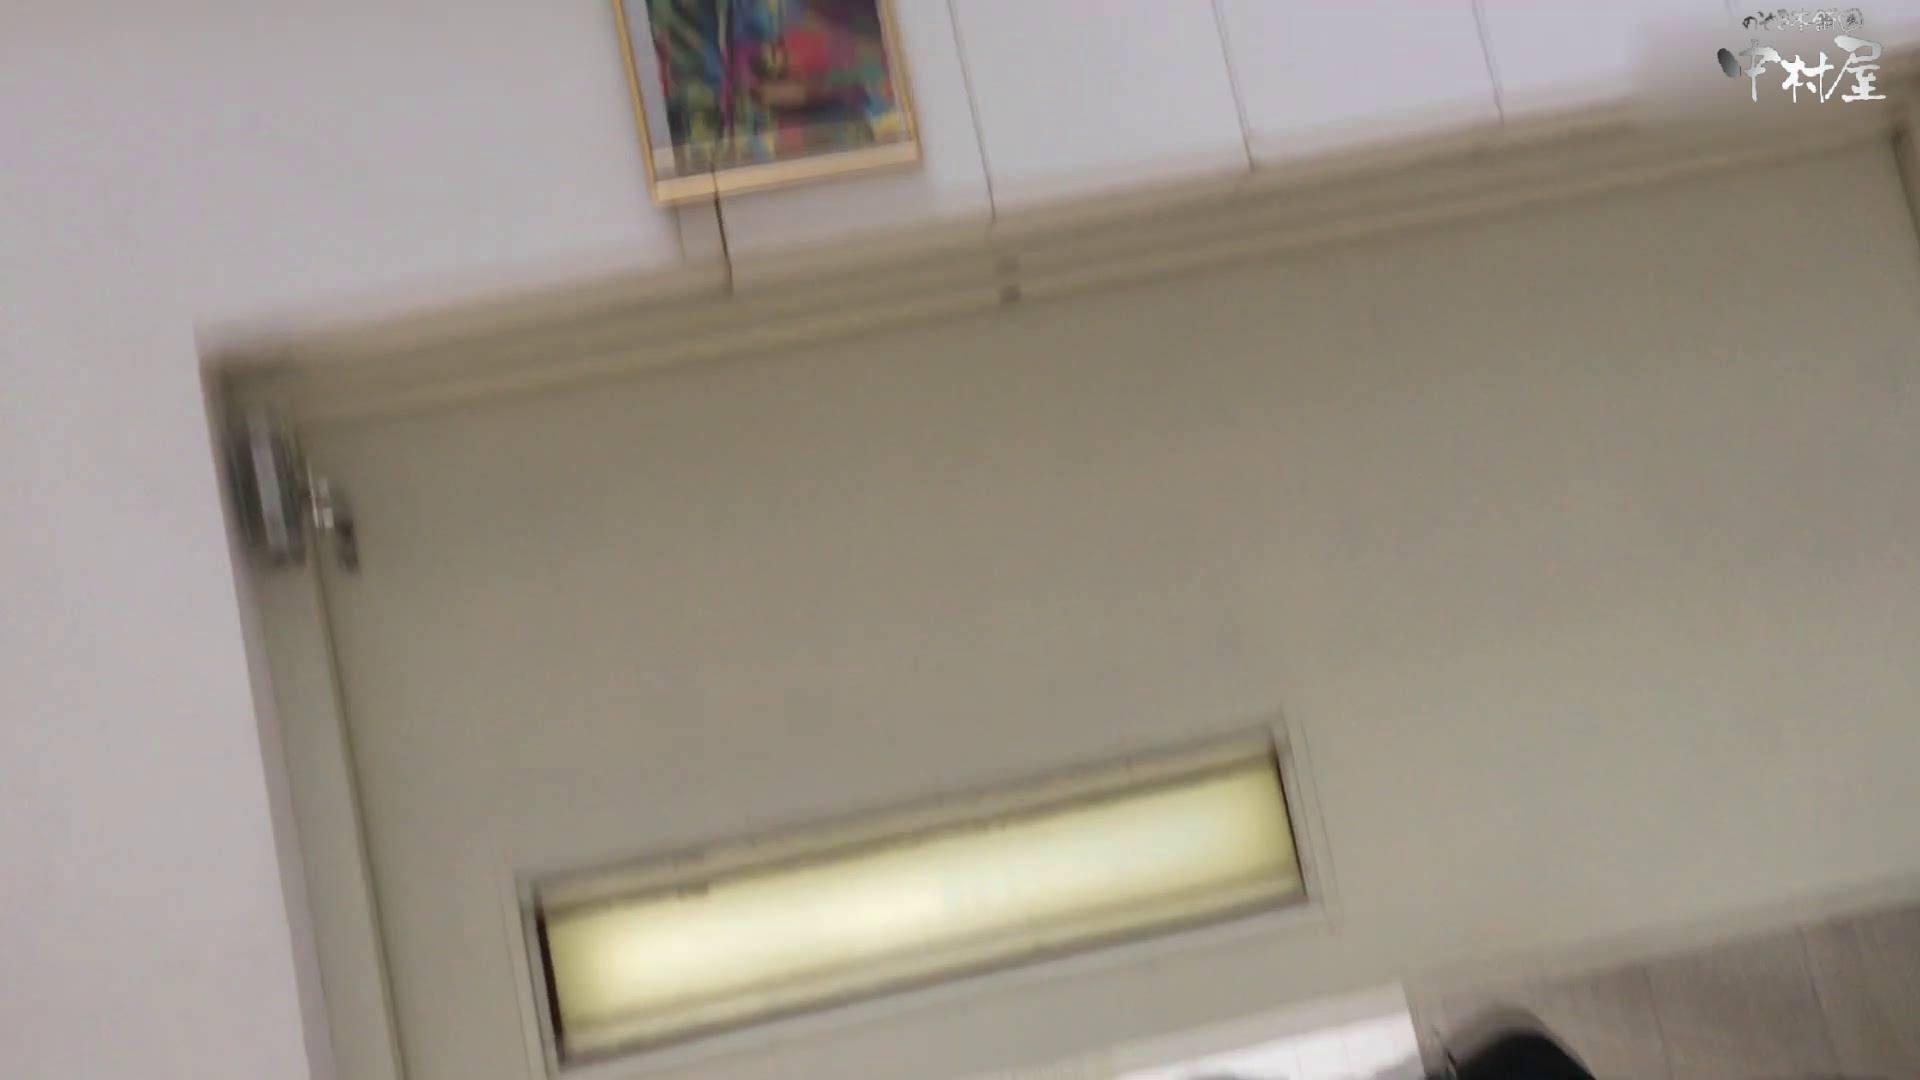 GOD HAND 芸術大学盗撮‼vol.95 OLのエロ生活 オマンコ動画キャプチャ 113連発 50